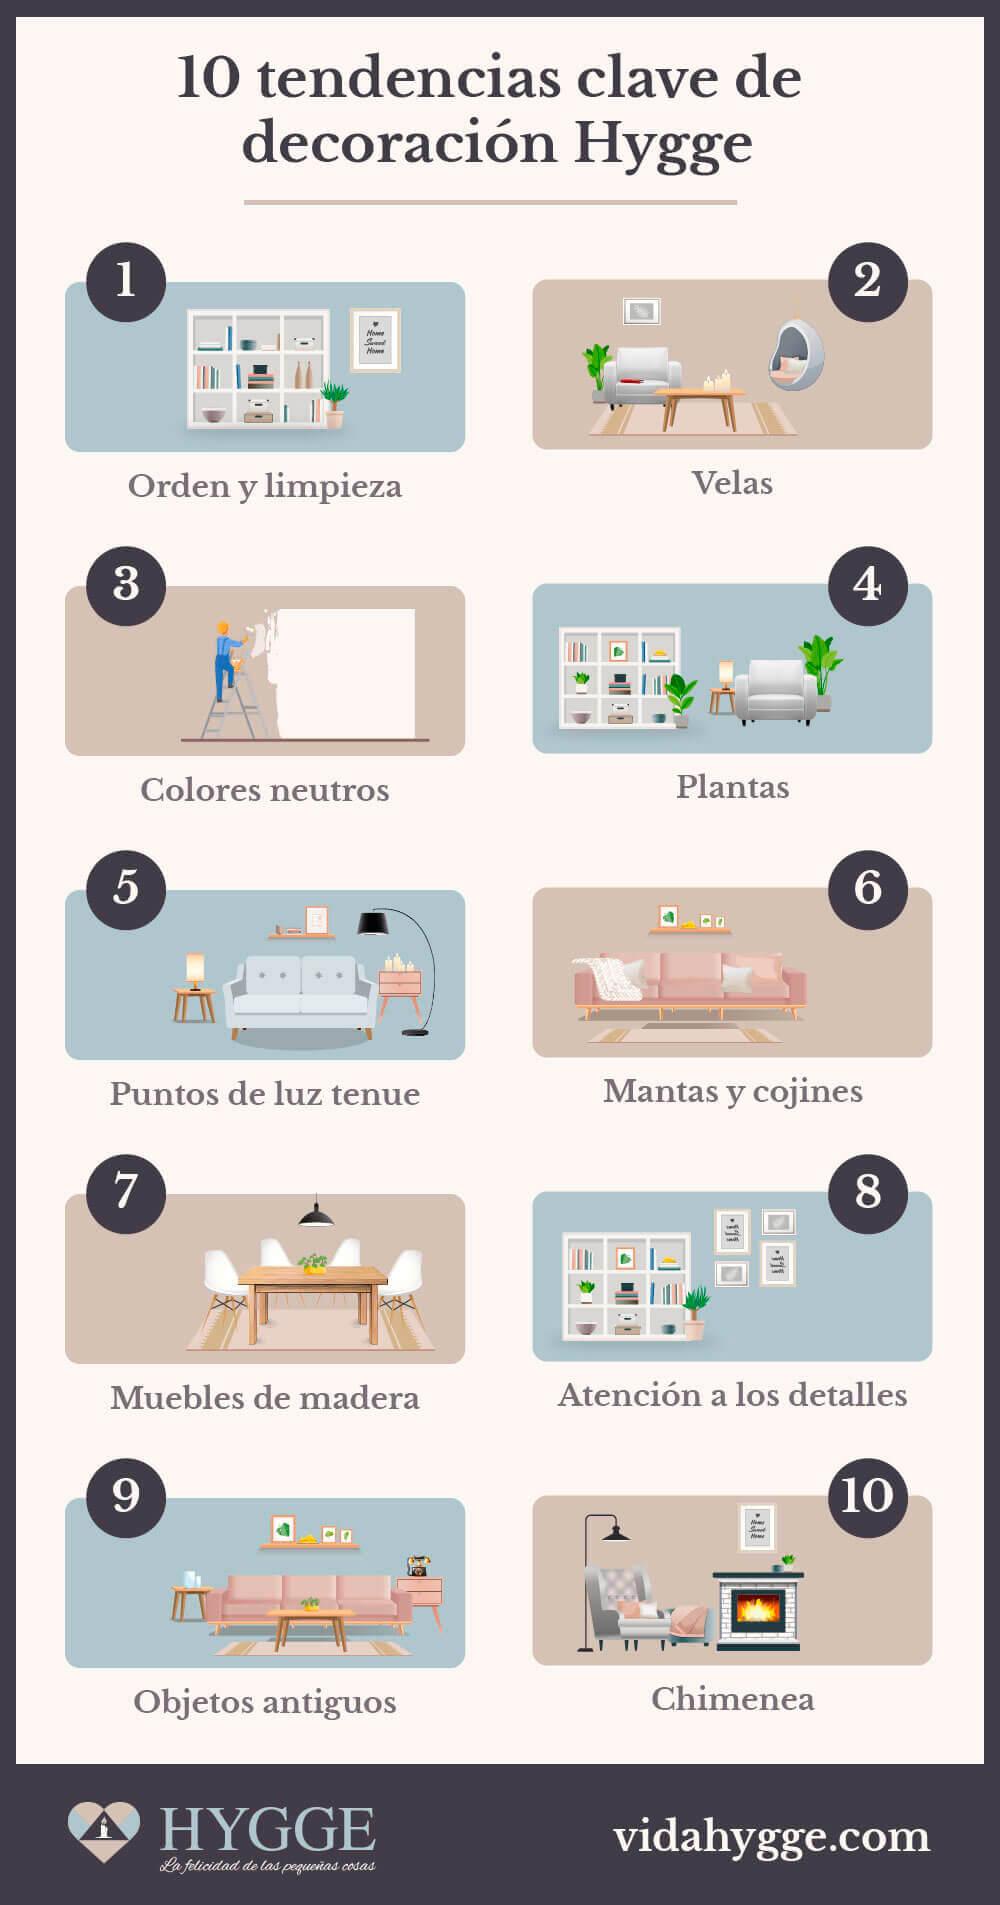 10 tendencias clave de decoración Hygge - infografía